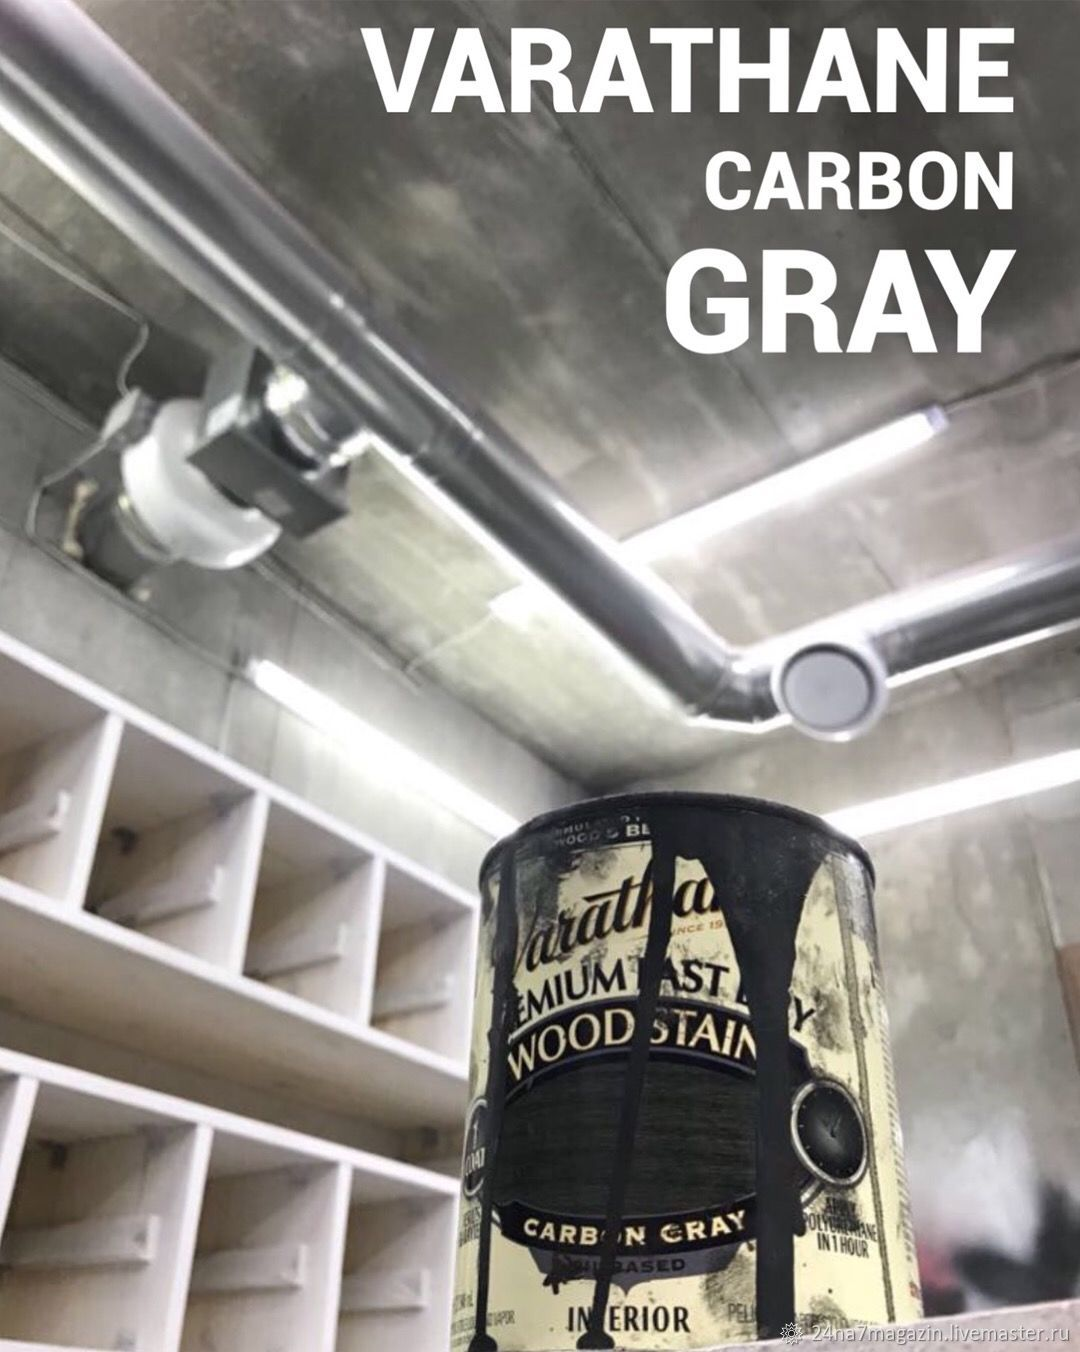 Varathane Premium Wood Stain Carbon Gray купить в